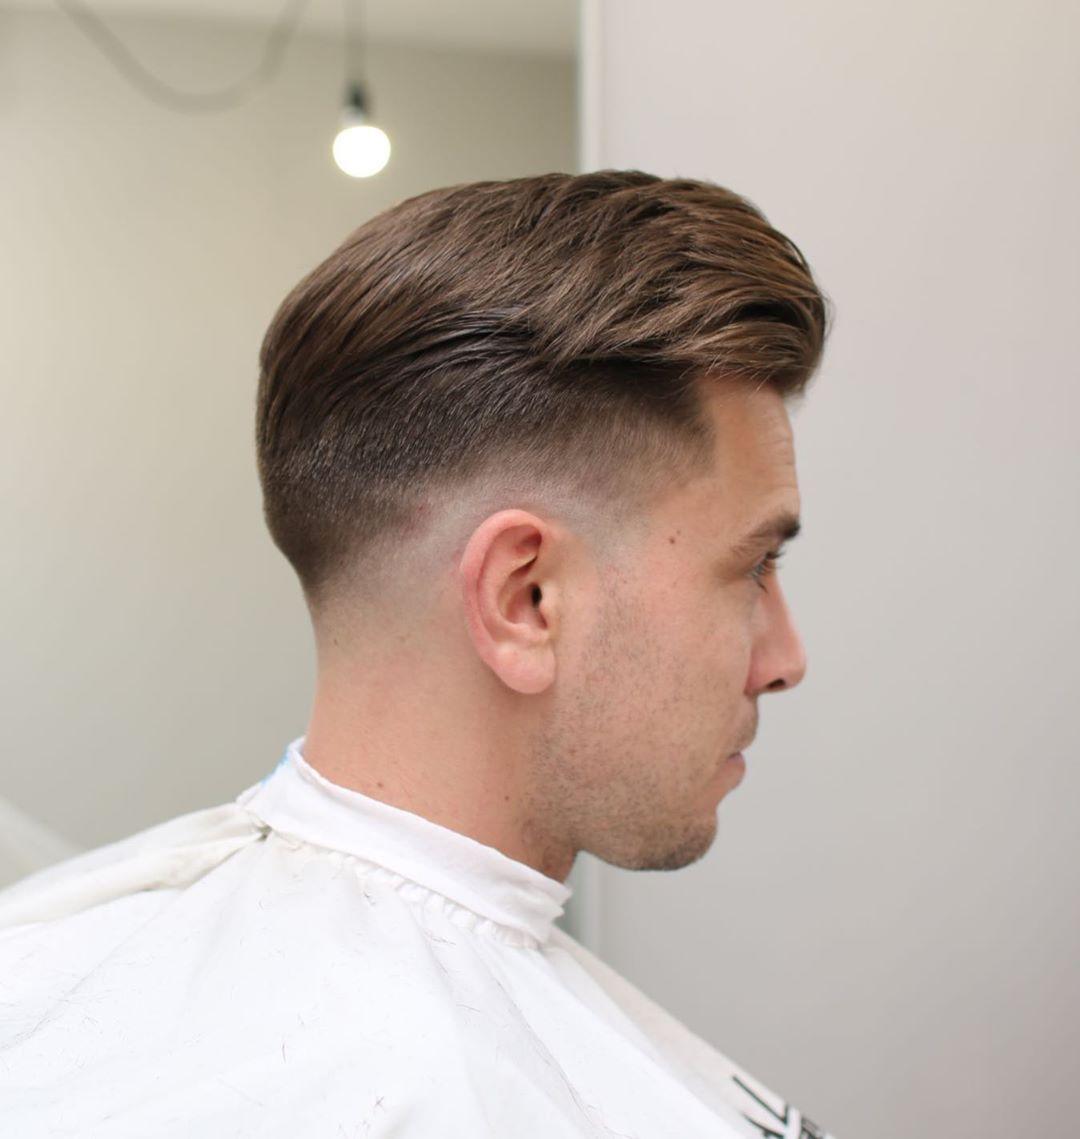 Mens Hair In General In 2020 Mens Hairstyles Hair And Beard Styles Haircuts For Men